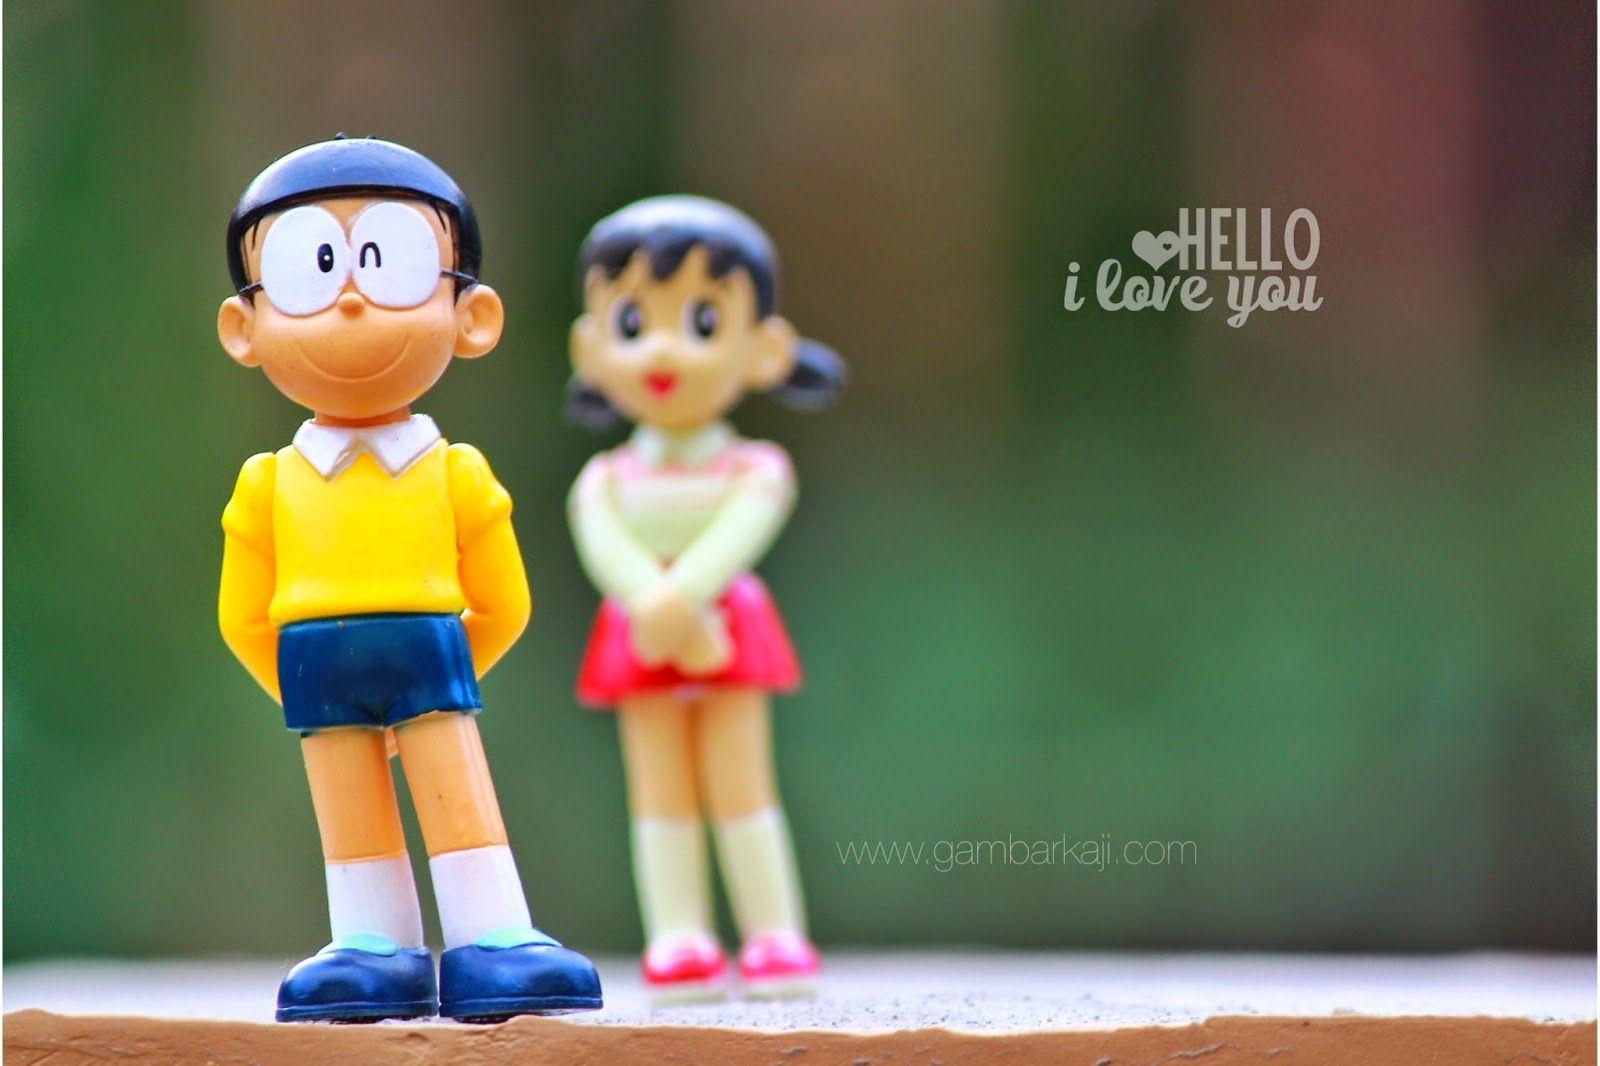 Doraemon Stand By Me 3D Photo HD Wallpaper Desktop Backgrounds 1600x1066